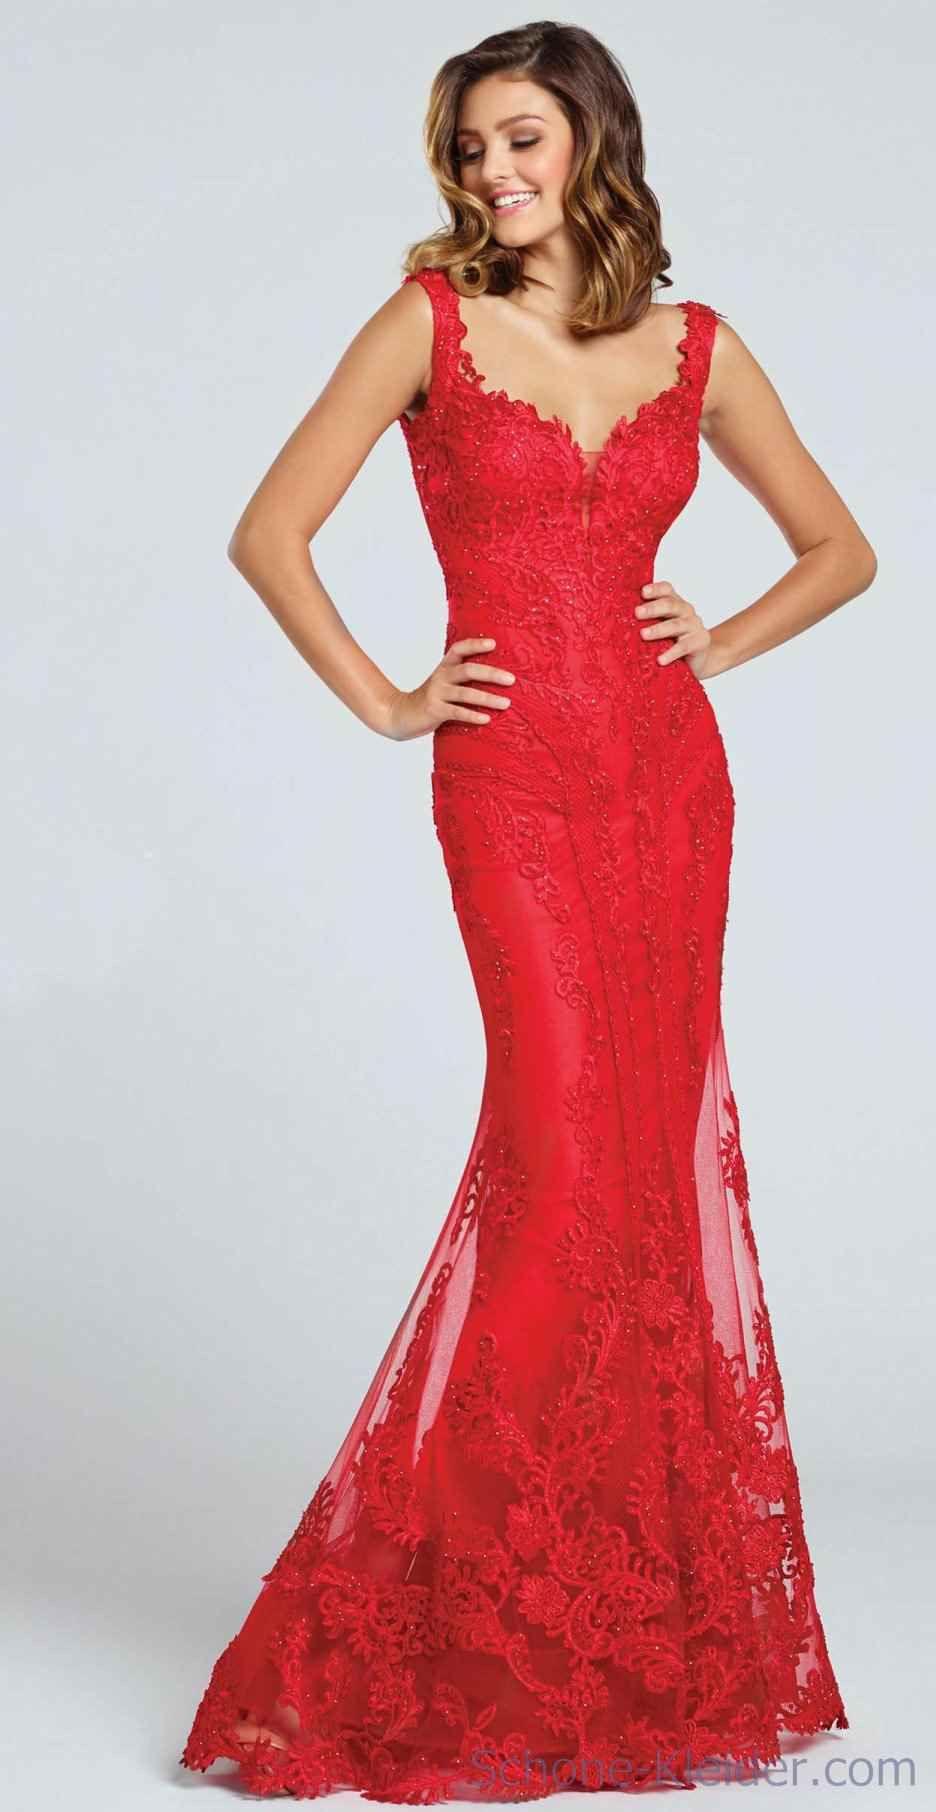 10 Wunderbar Lange Elegante Abendkleider Design17 Fantastisch Lange Elegante Abendkleider Spezialgebiet